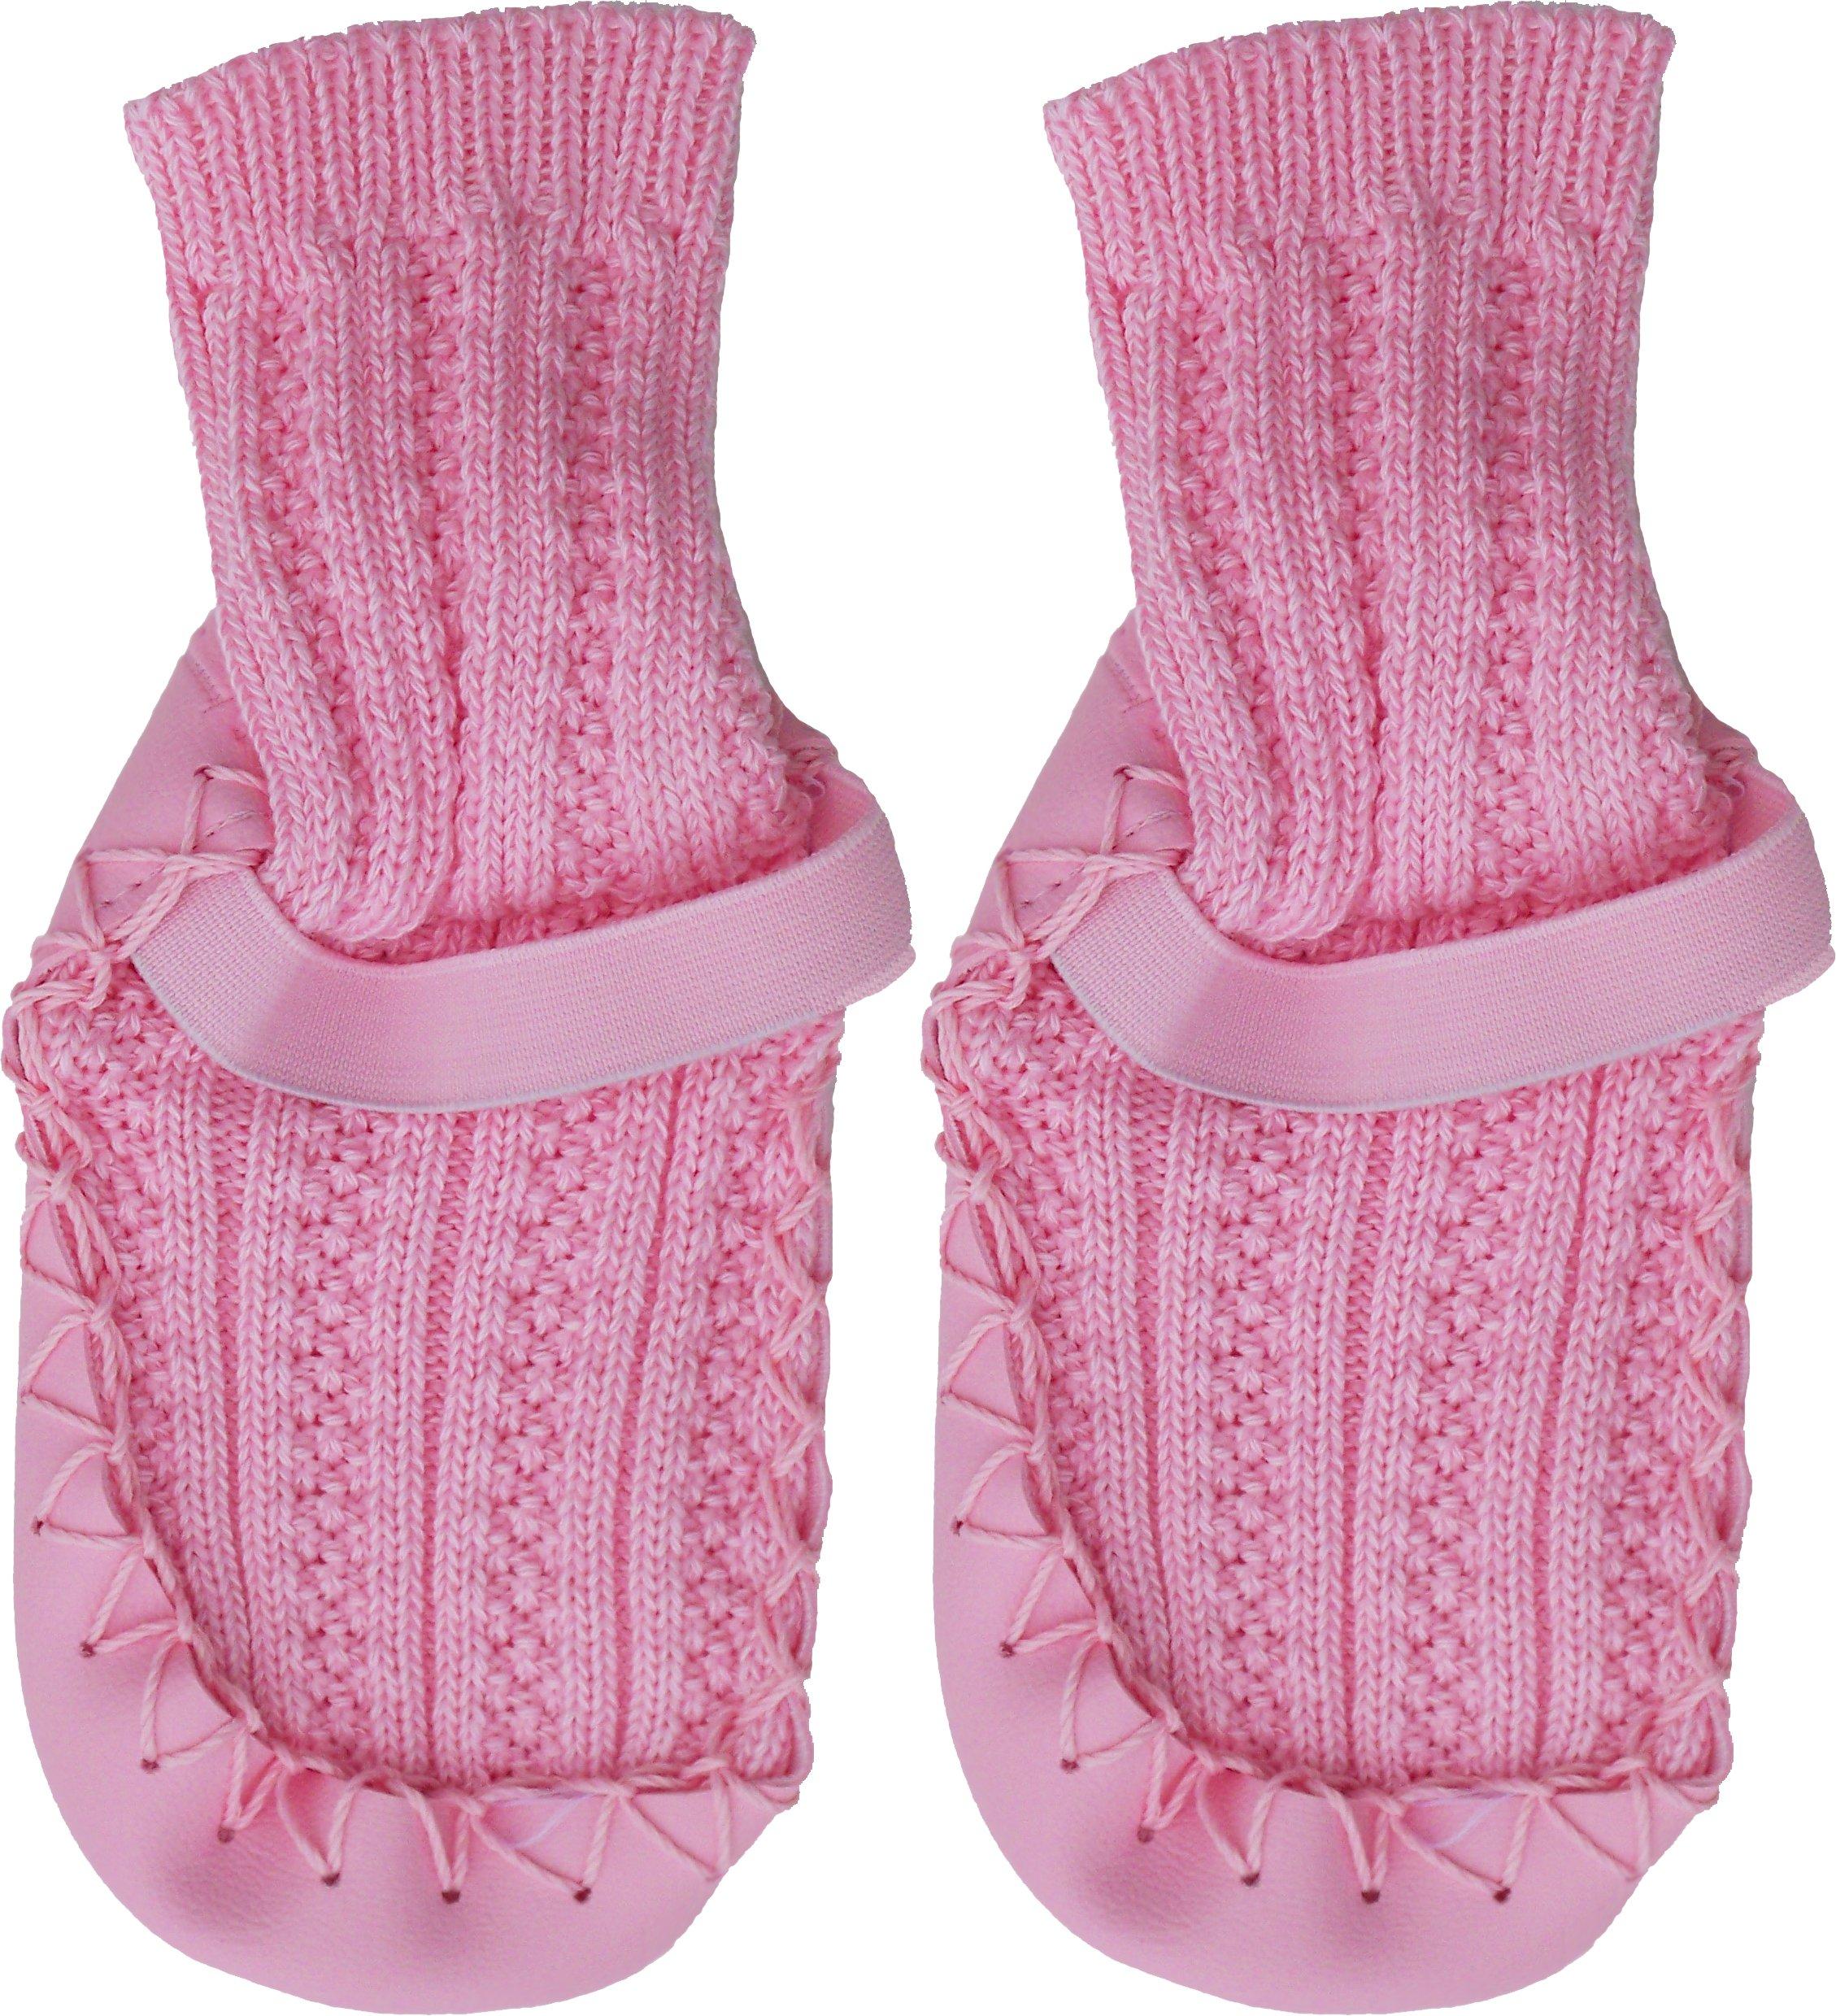 Konfetti Cable Knit Swedish Moccasin Slipper Socks by Konfetti (Image #2)